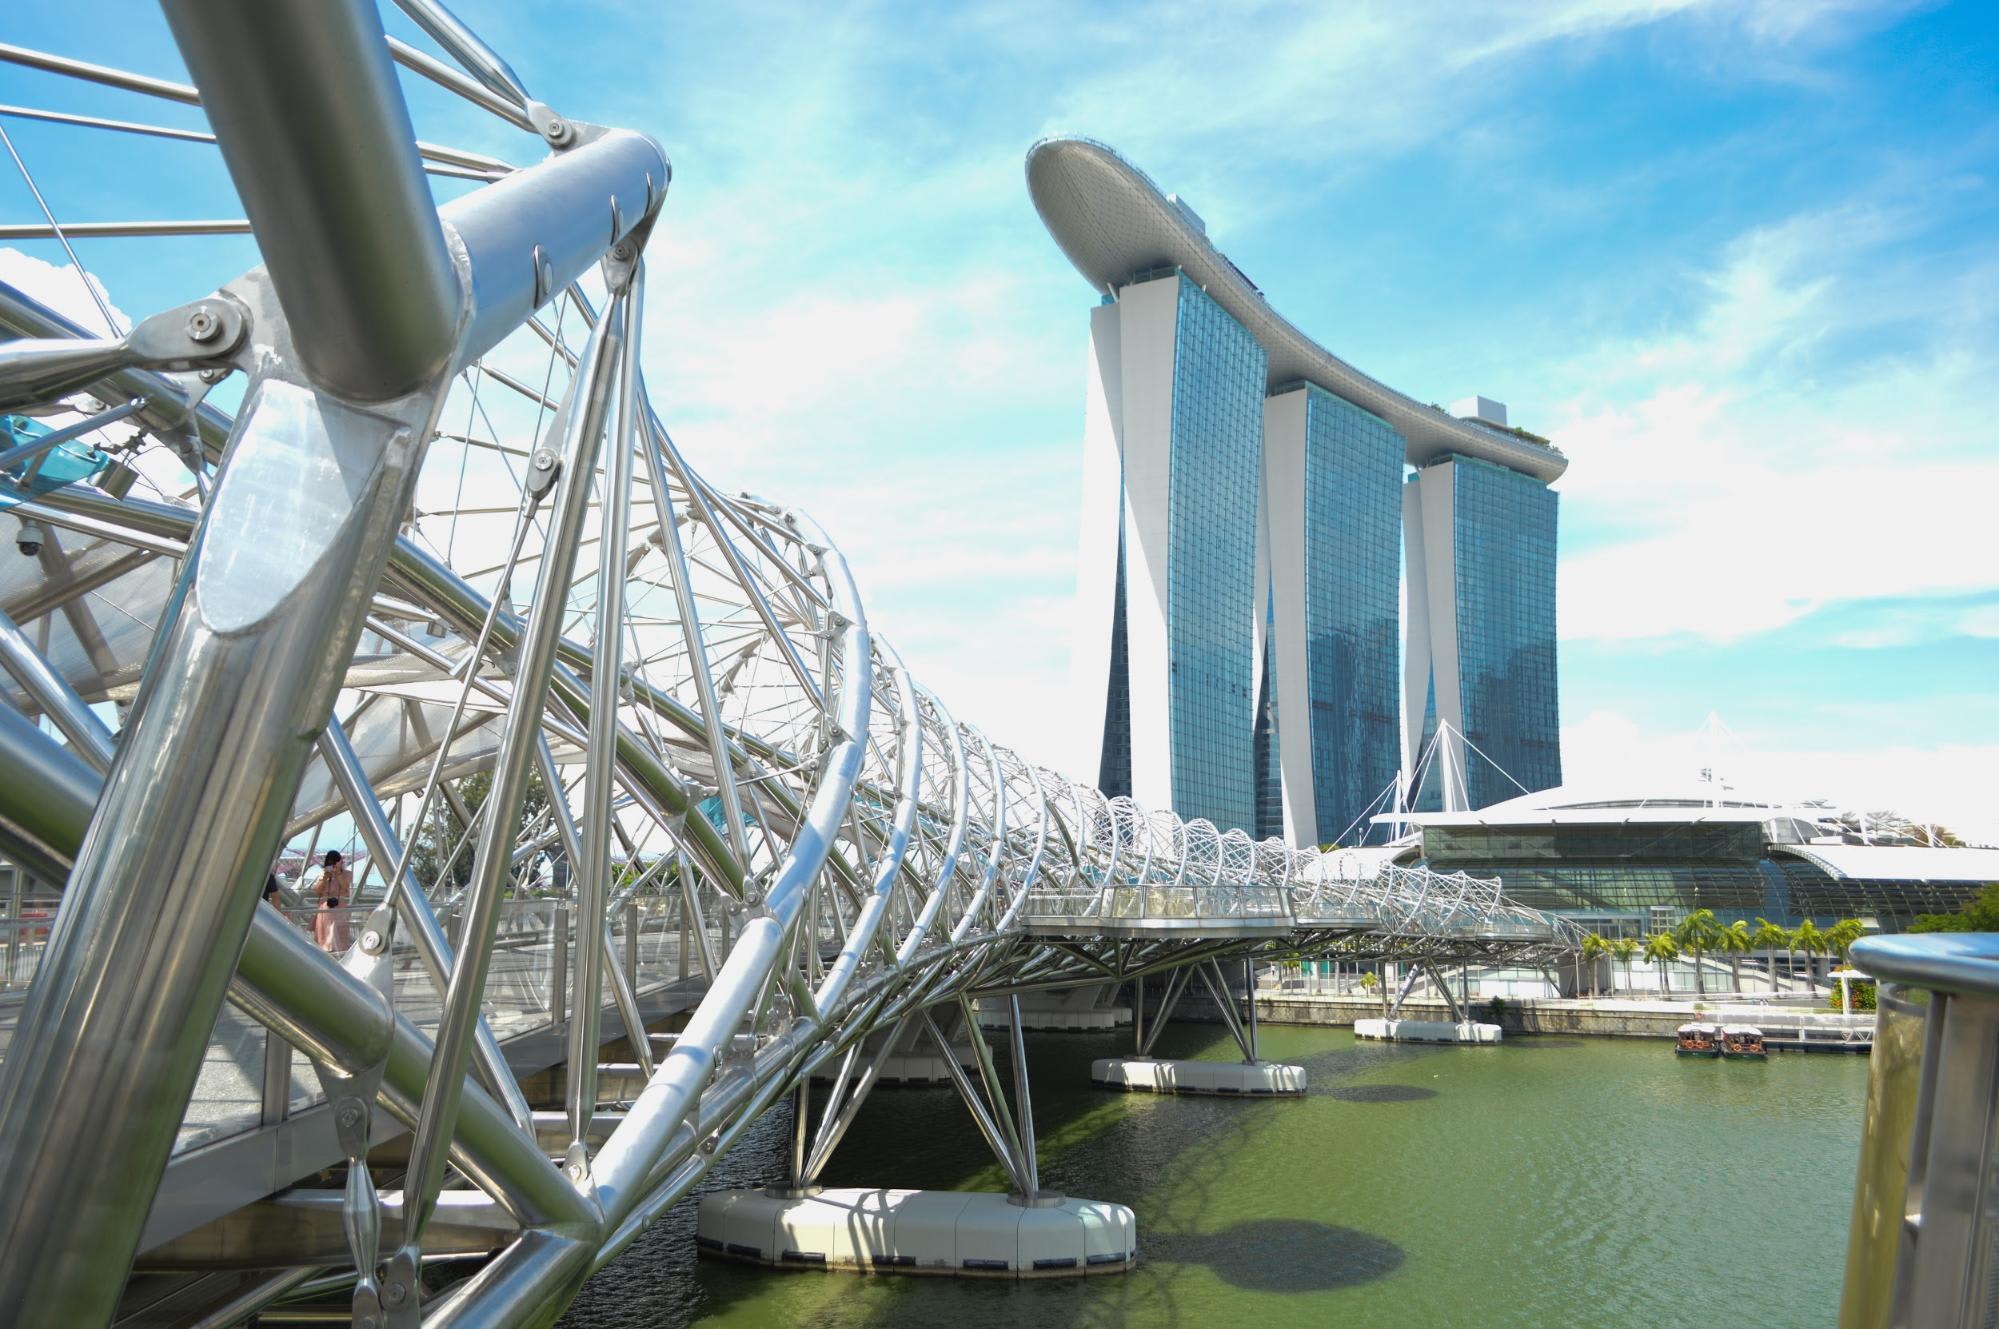 marina bay sands singapore 11 noi nhat dinh phai den7